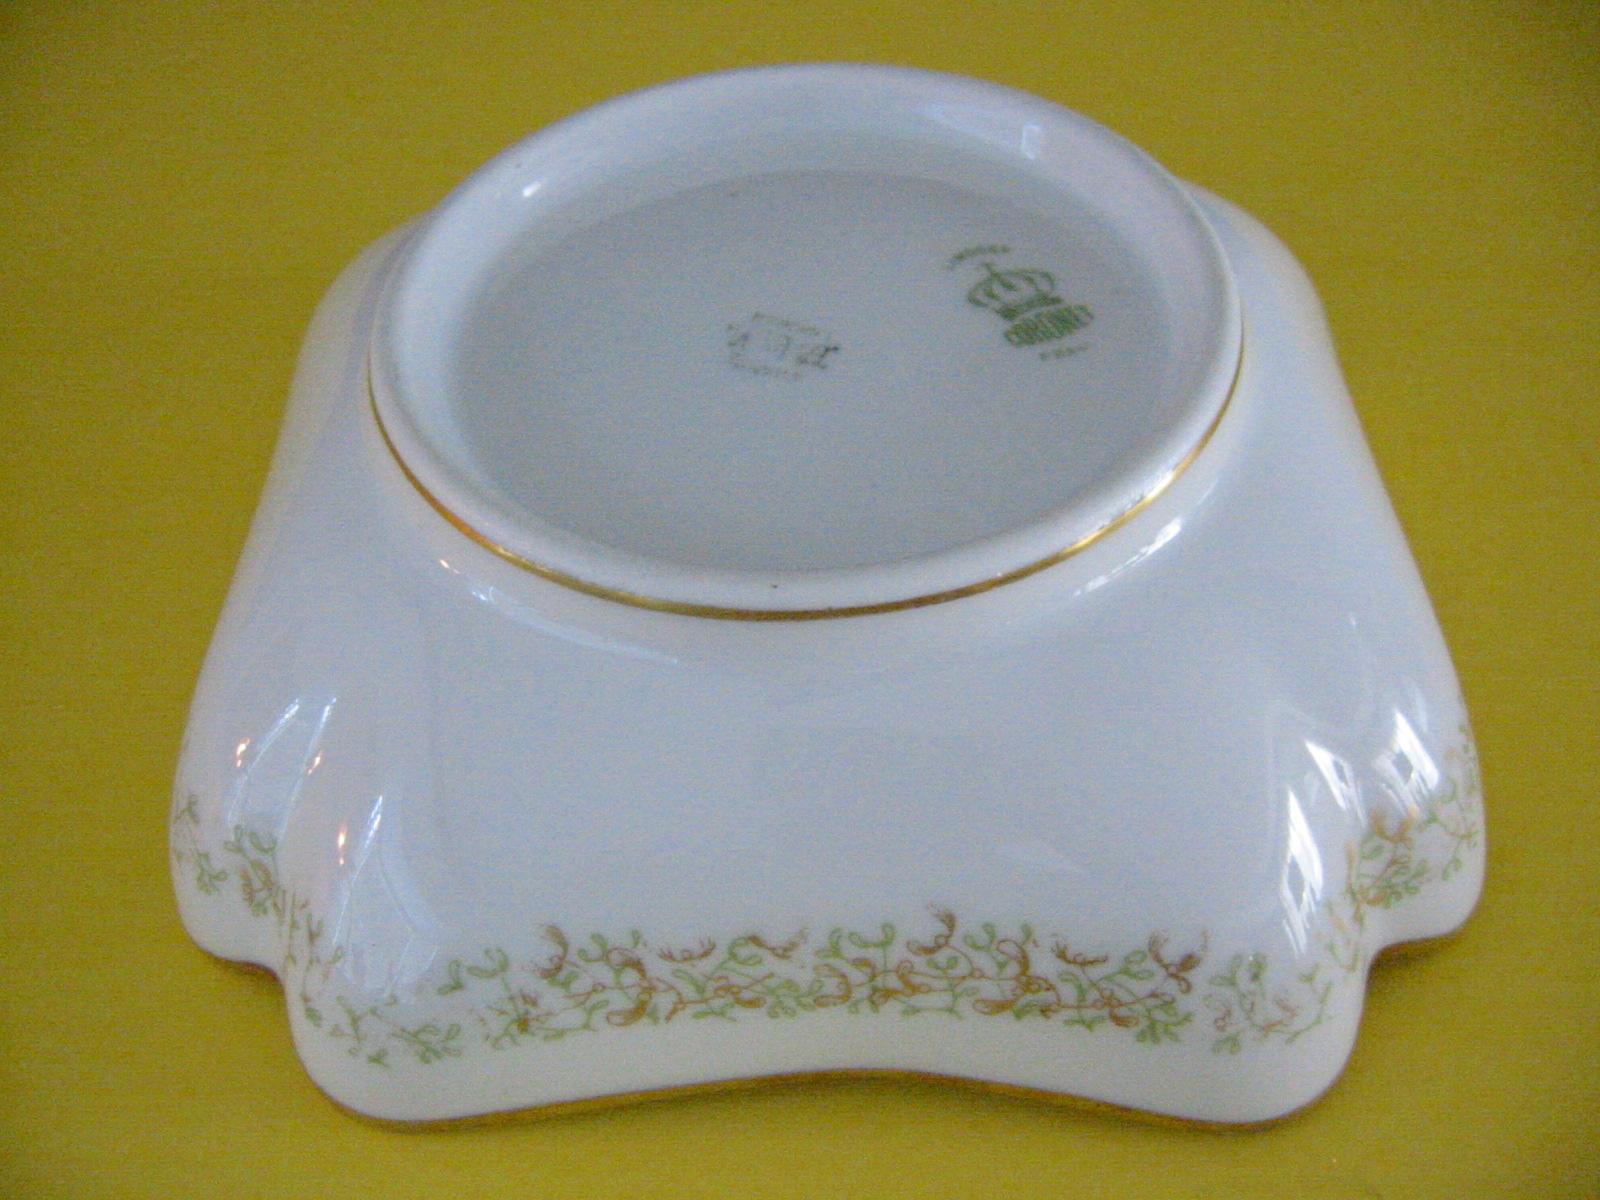 Limoges Coronet France Porcelain Bowl Gilt Decoration For Sale ...